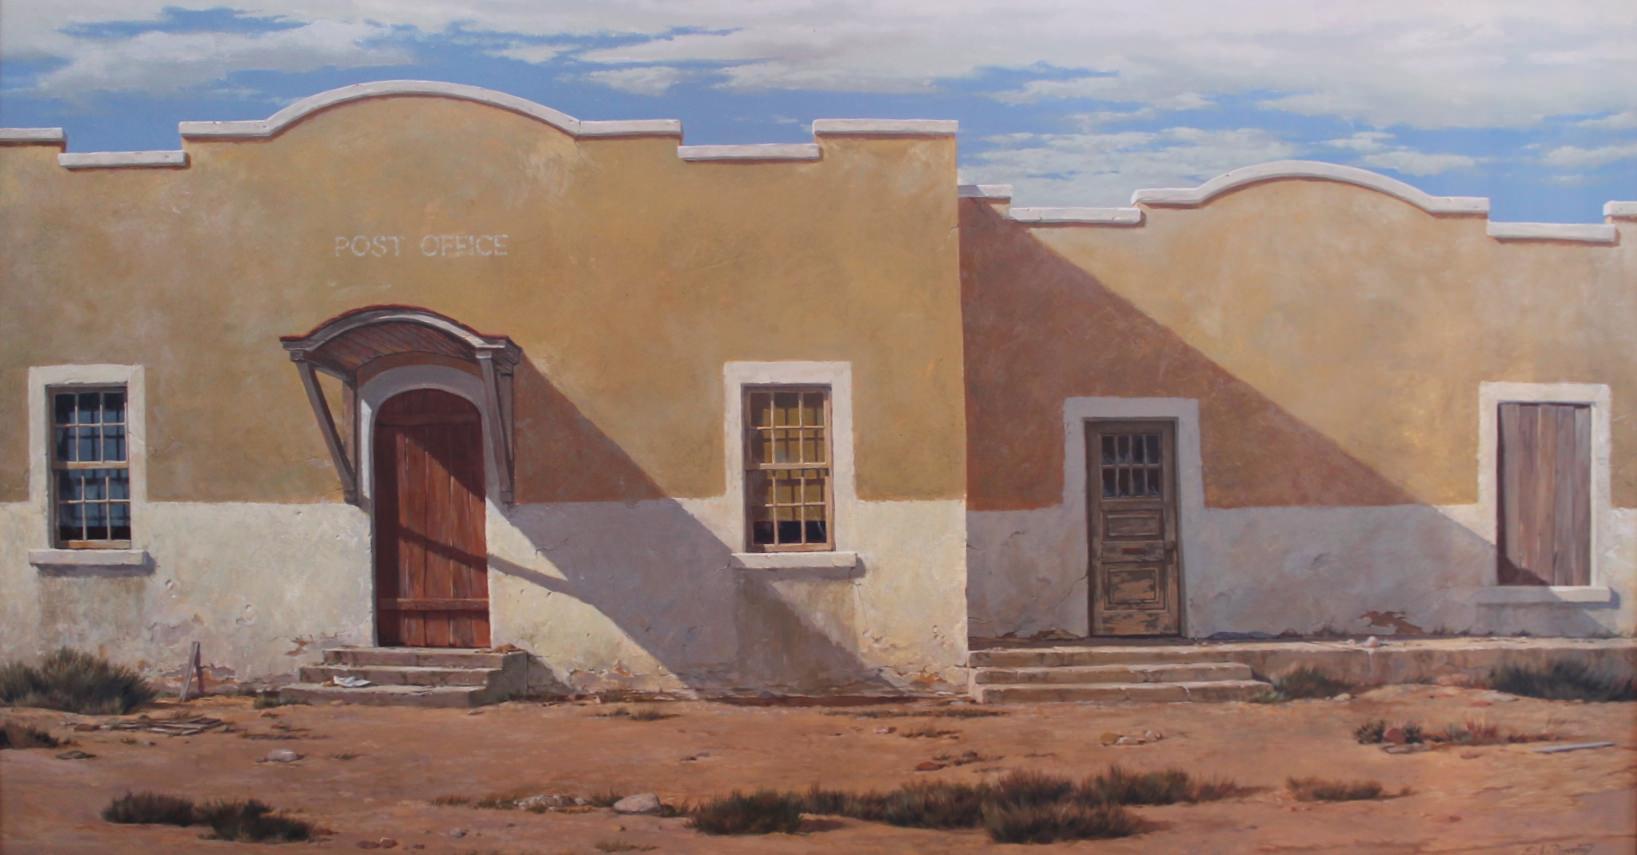 Ghost Post Office  by Elmer Ladislaw Novotny